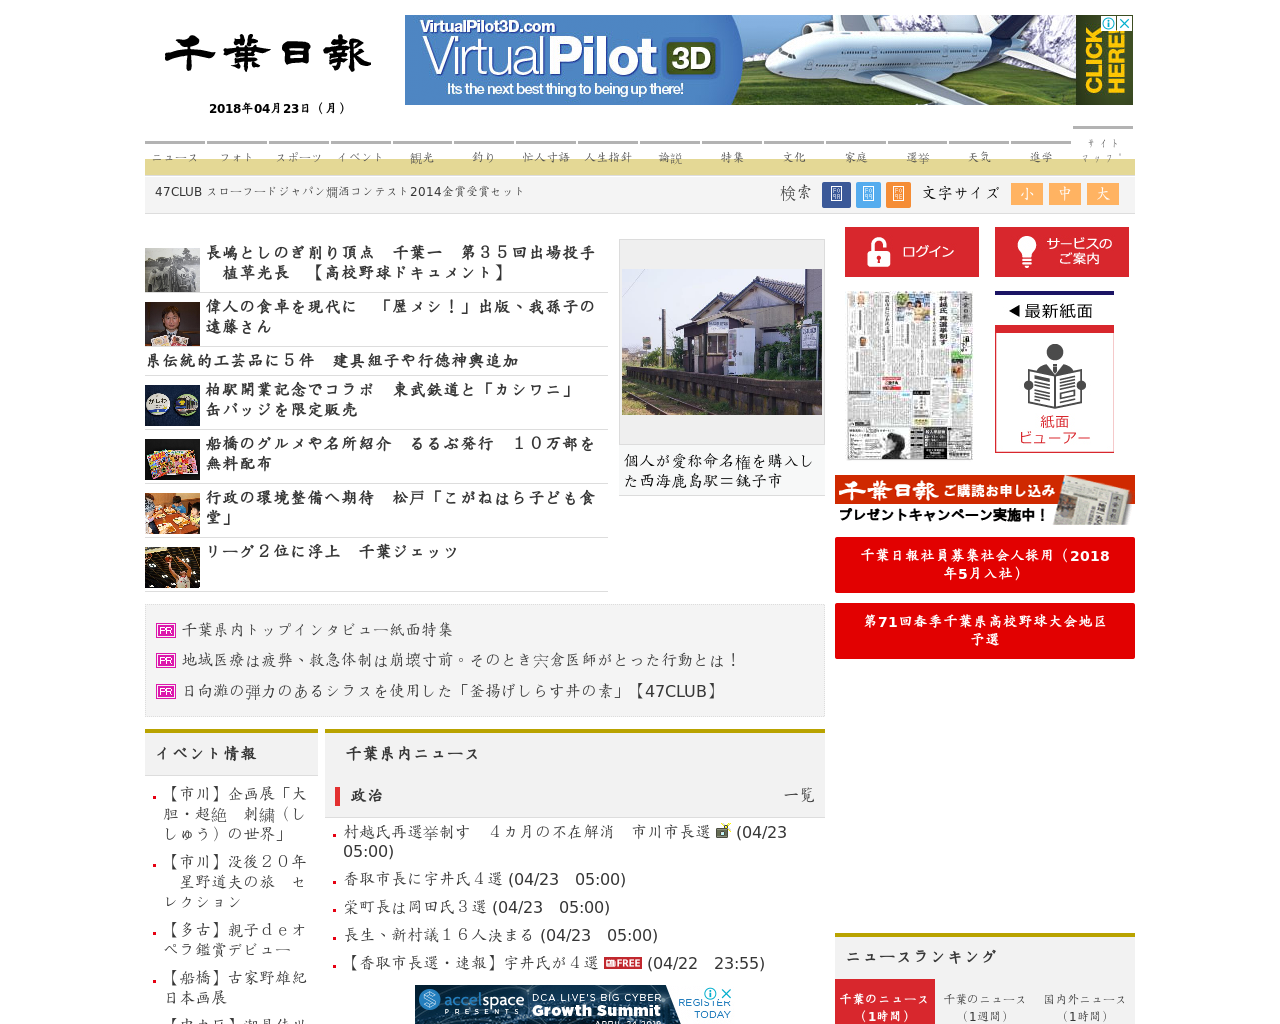 www.chibanippo.co.jp(2018/04/23 14:50:41)